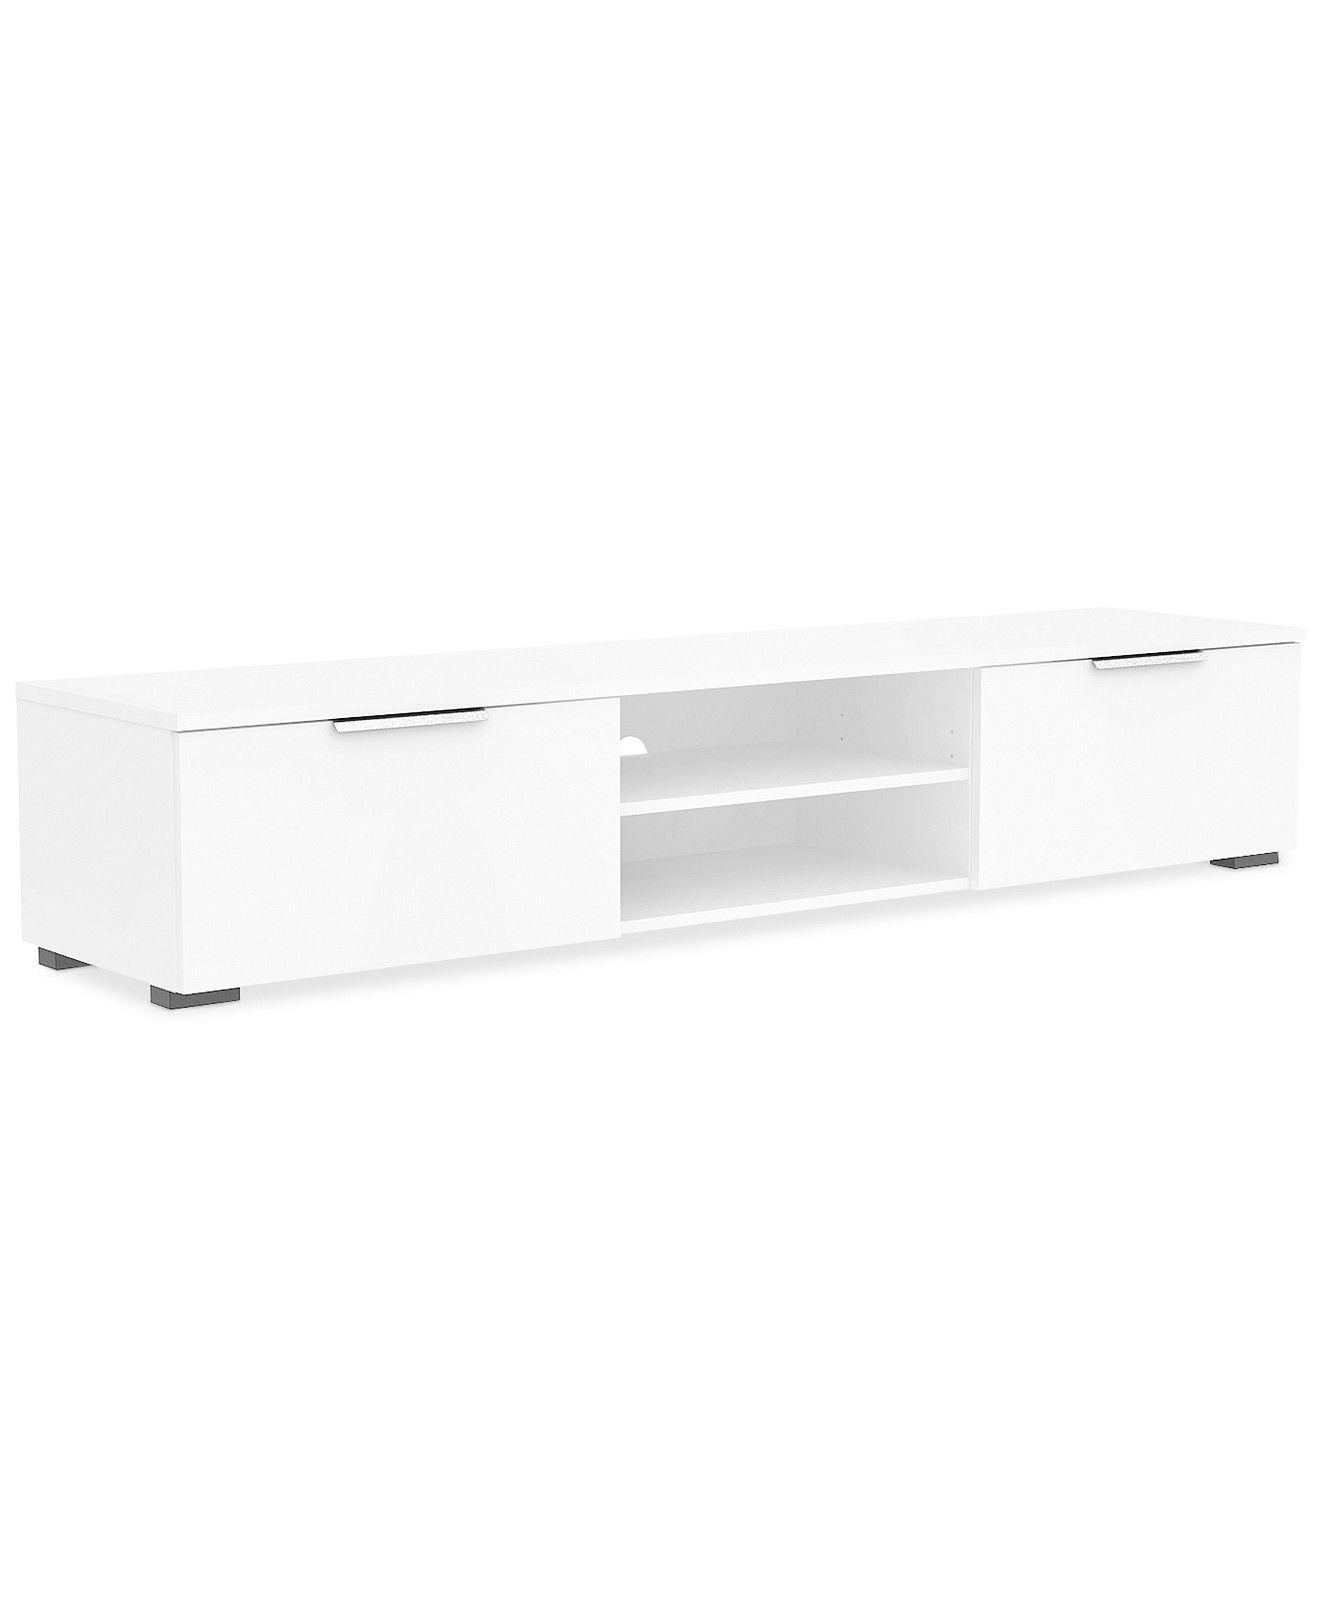 Tvilum Roswell Ready To Assemble Tv Unit Direct Ship Furniture Sale Furniture Macy S Tv Stand Tvilum Mattress Furniture